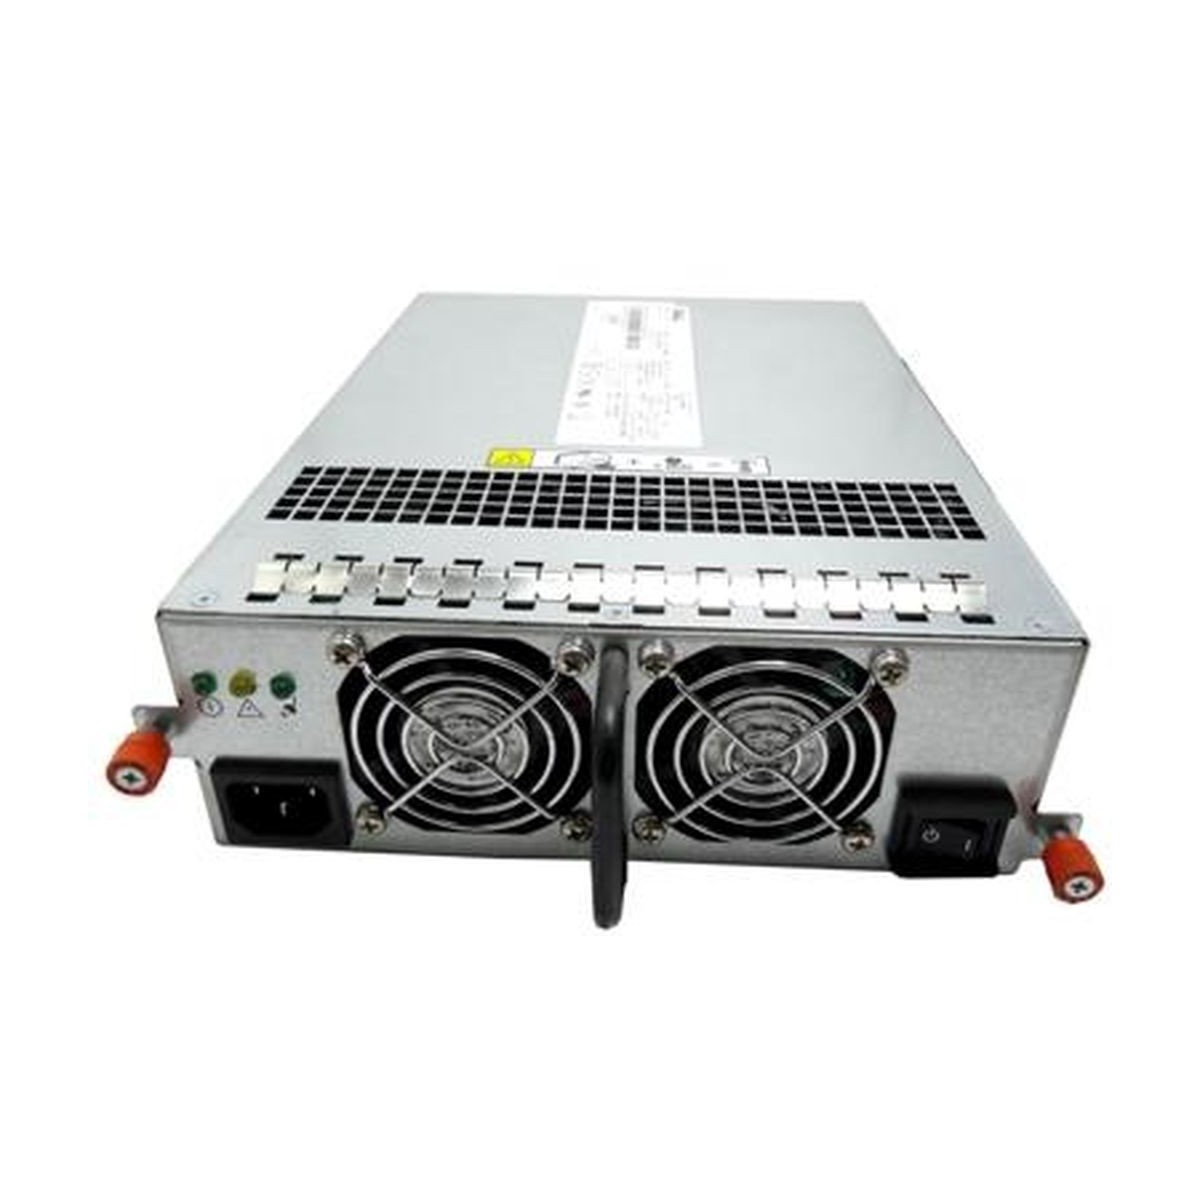 PLYTA GLOWNA SUPERMICRO X5DP8-G2 2xPGA604